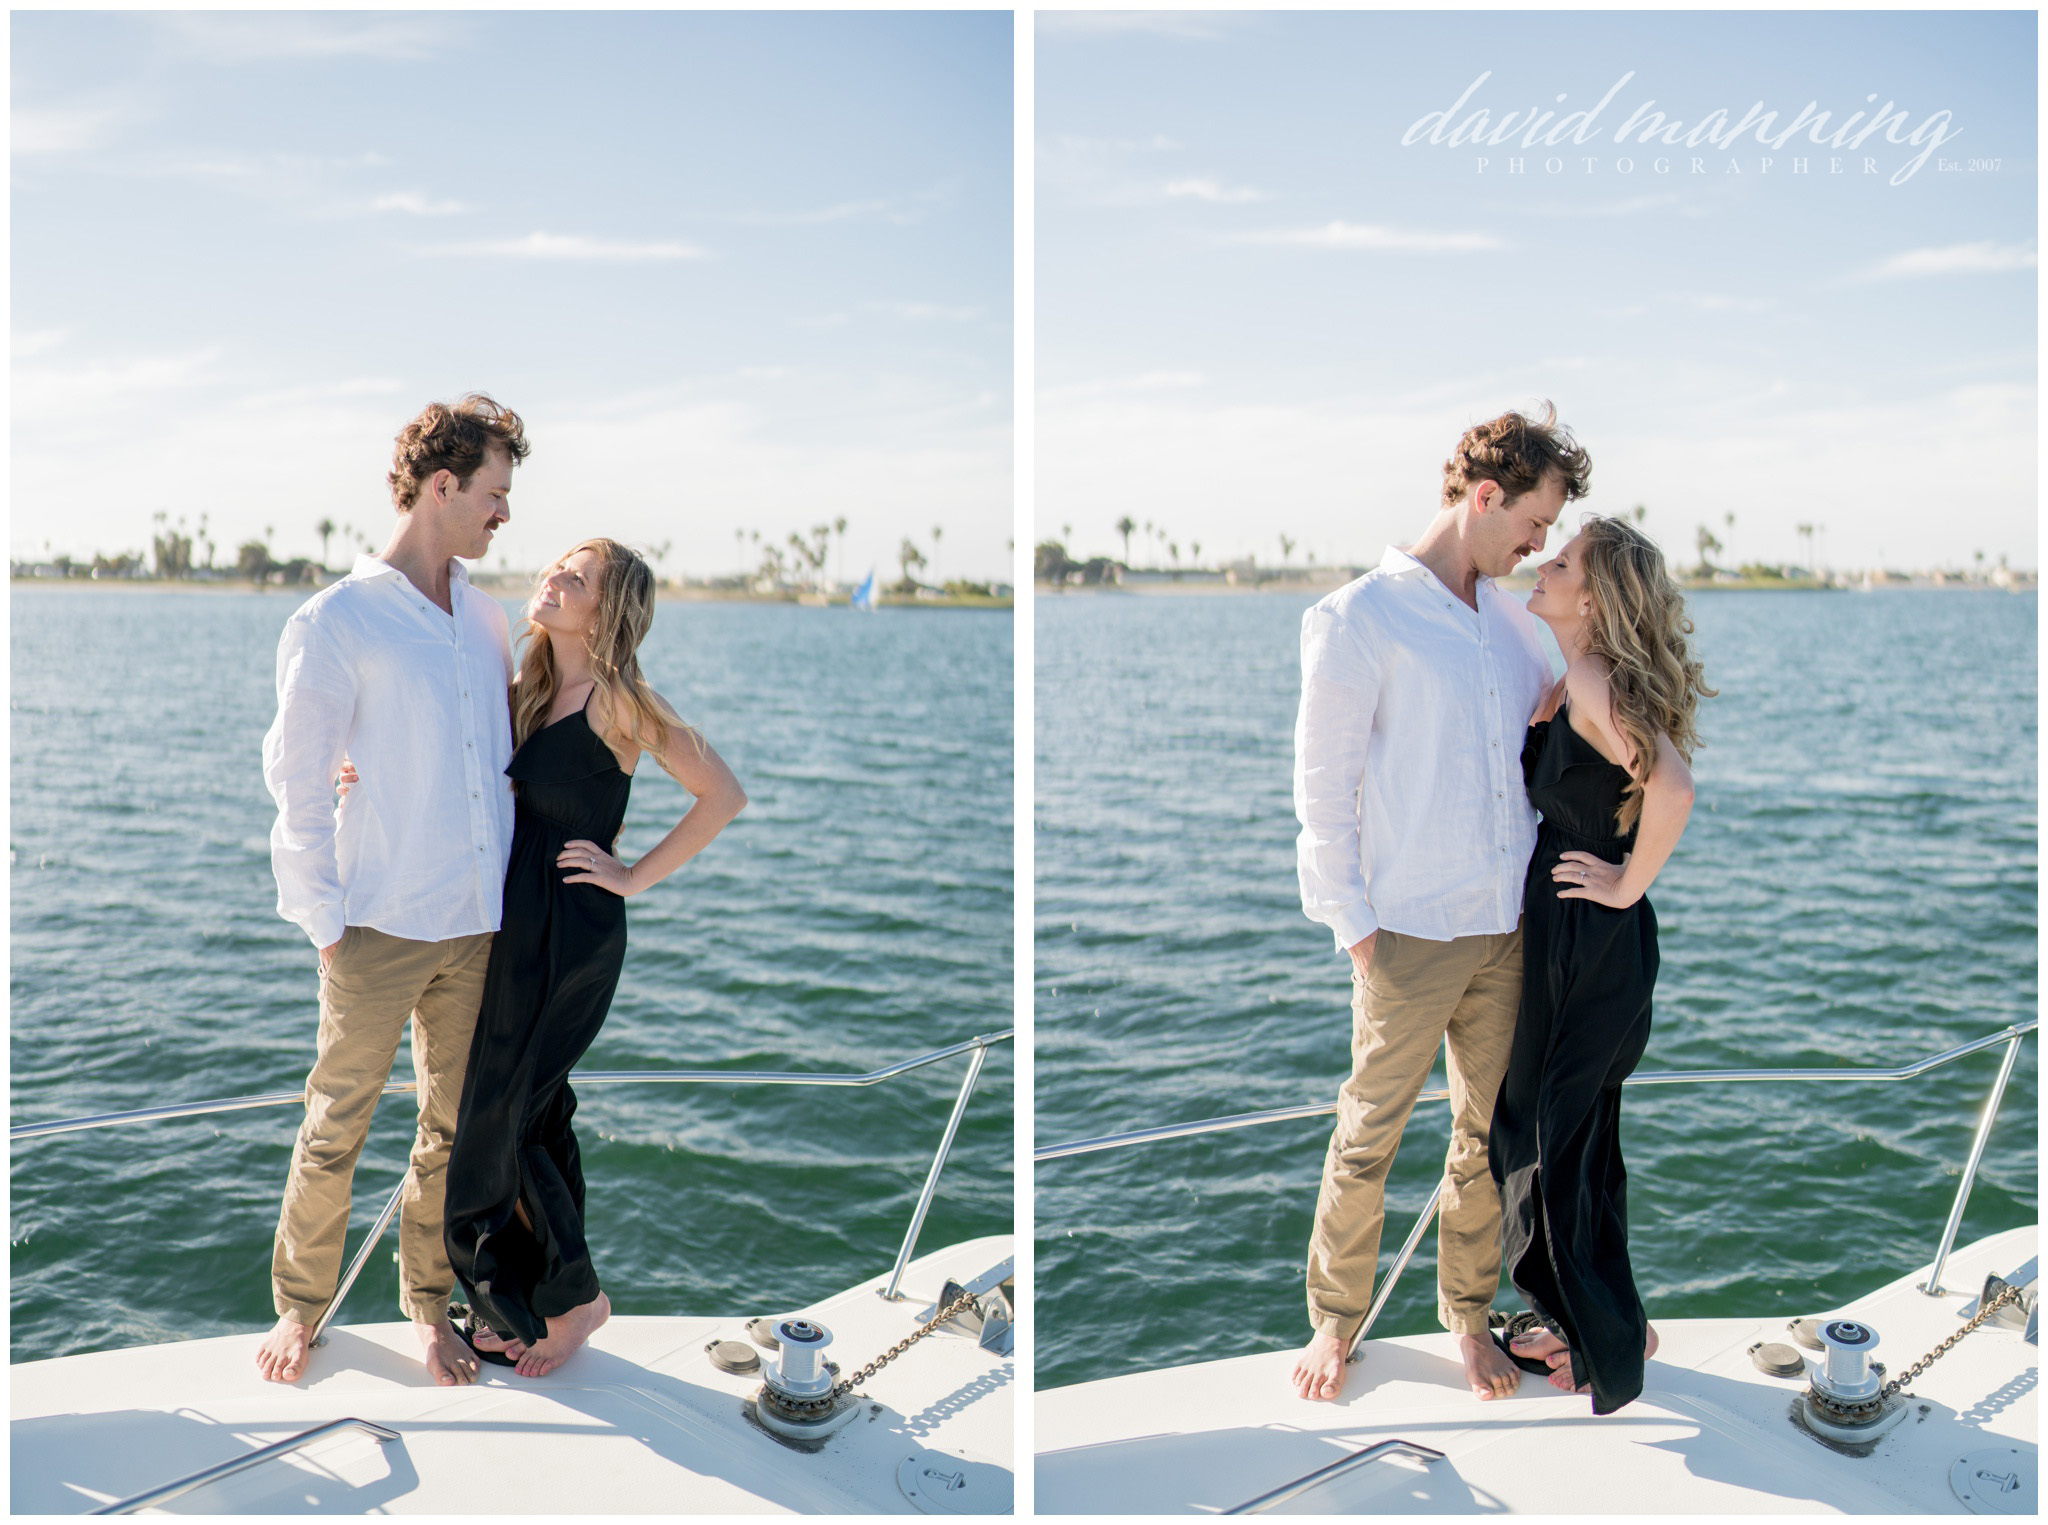 Alyssa-Taylor-Engagement-David-Manning-Photographer-0059.JPG